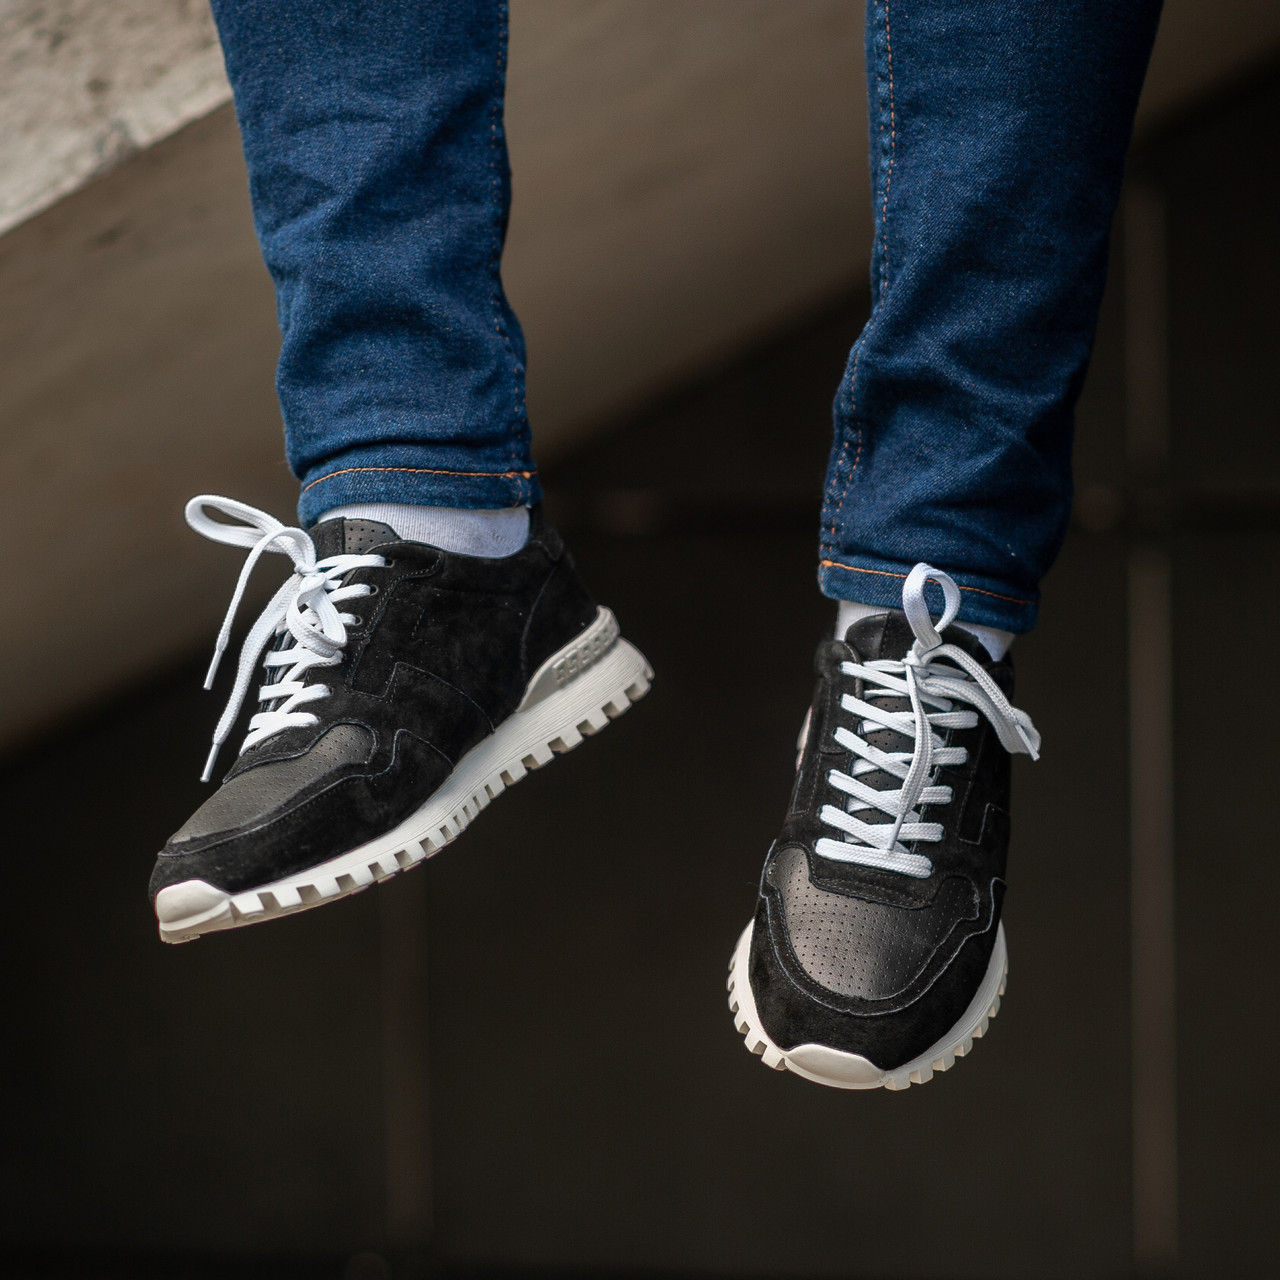 Мужские кроссовки South Classic black. Натуральная замша